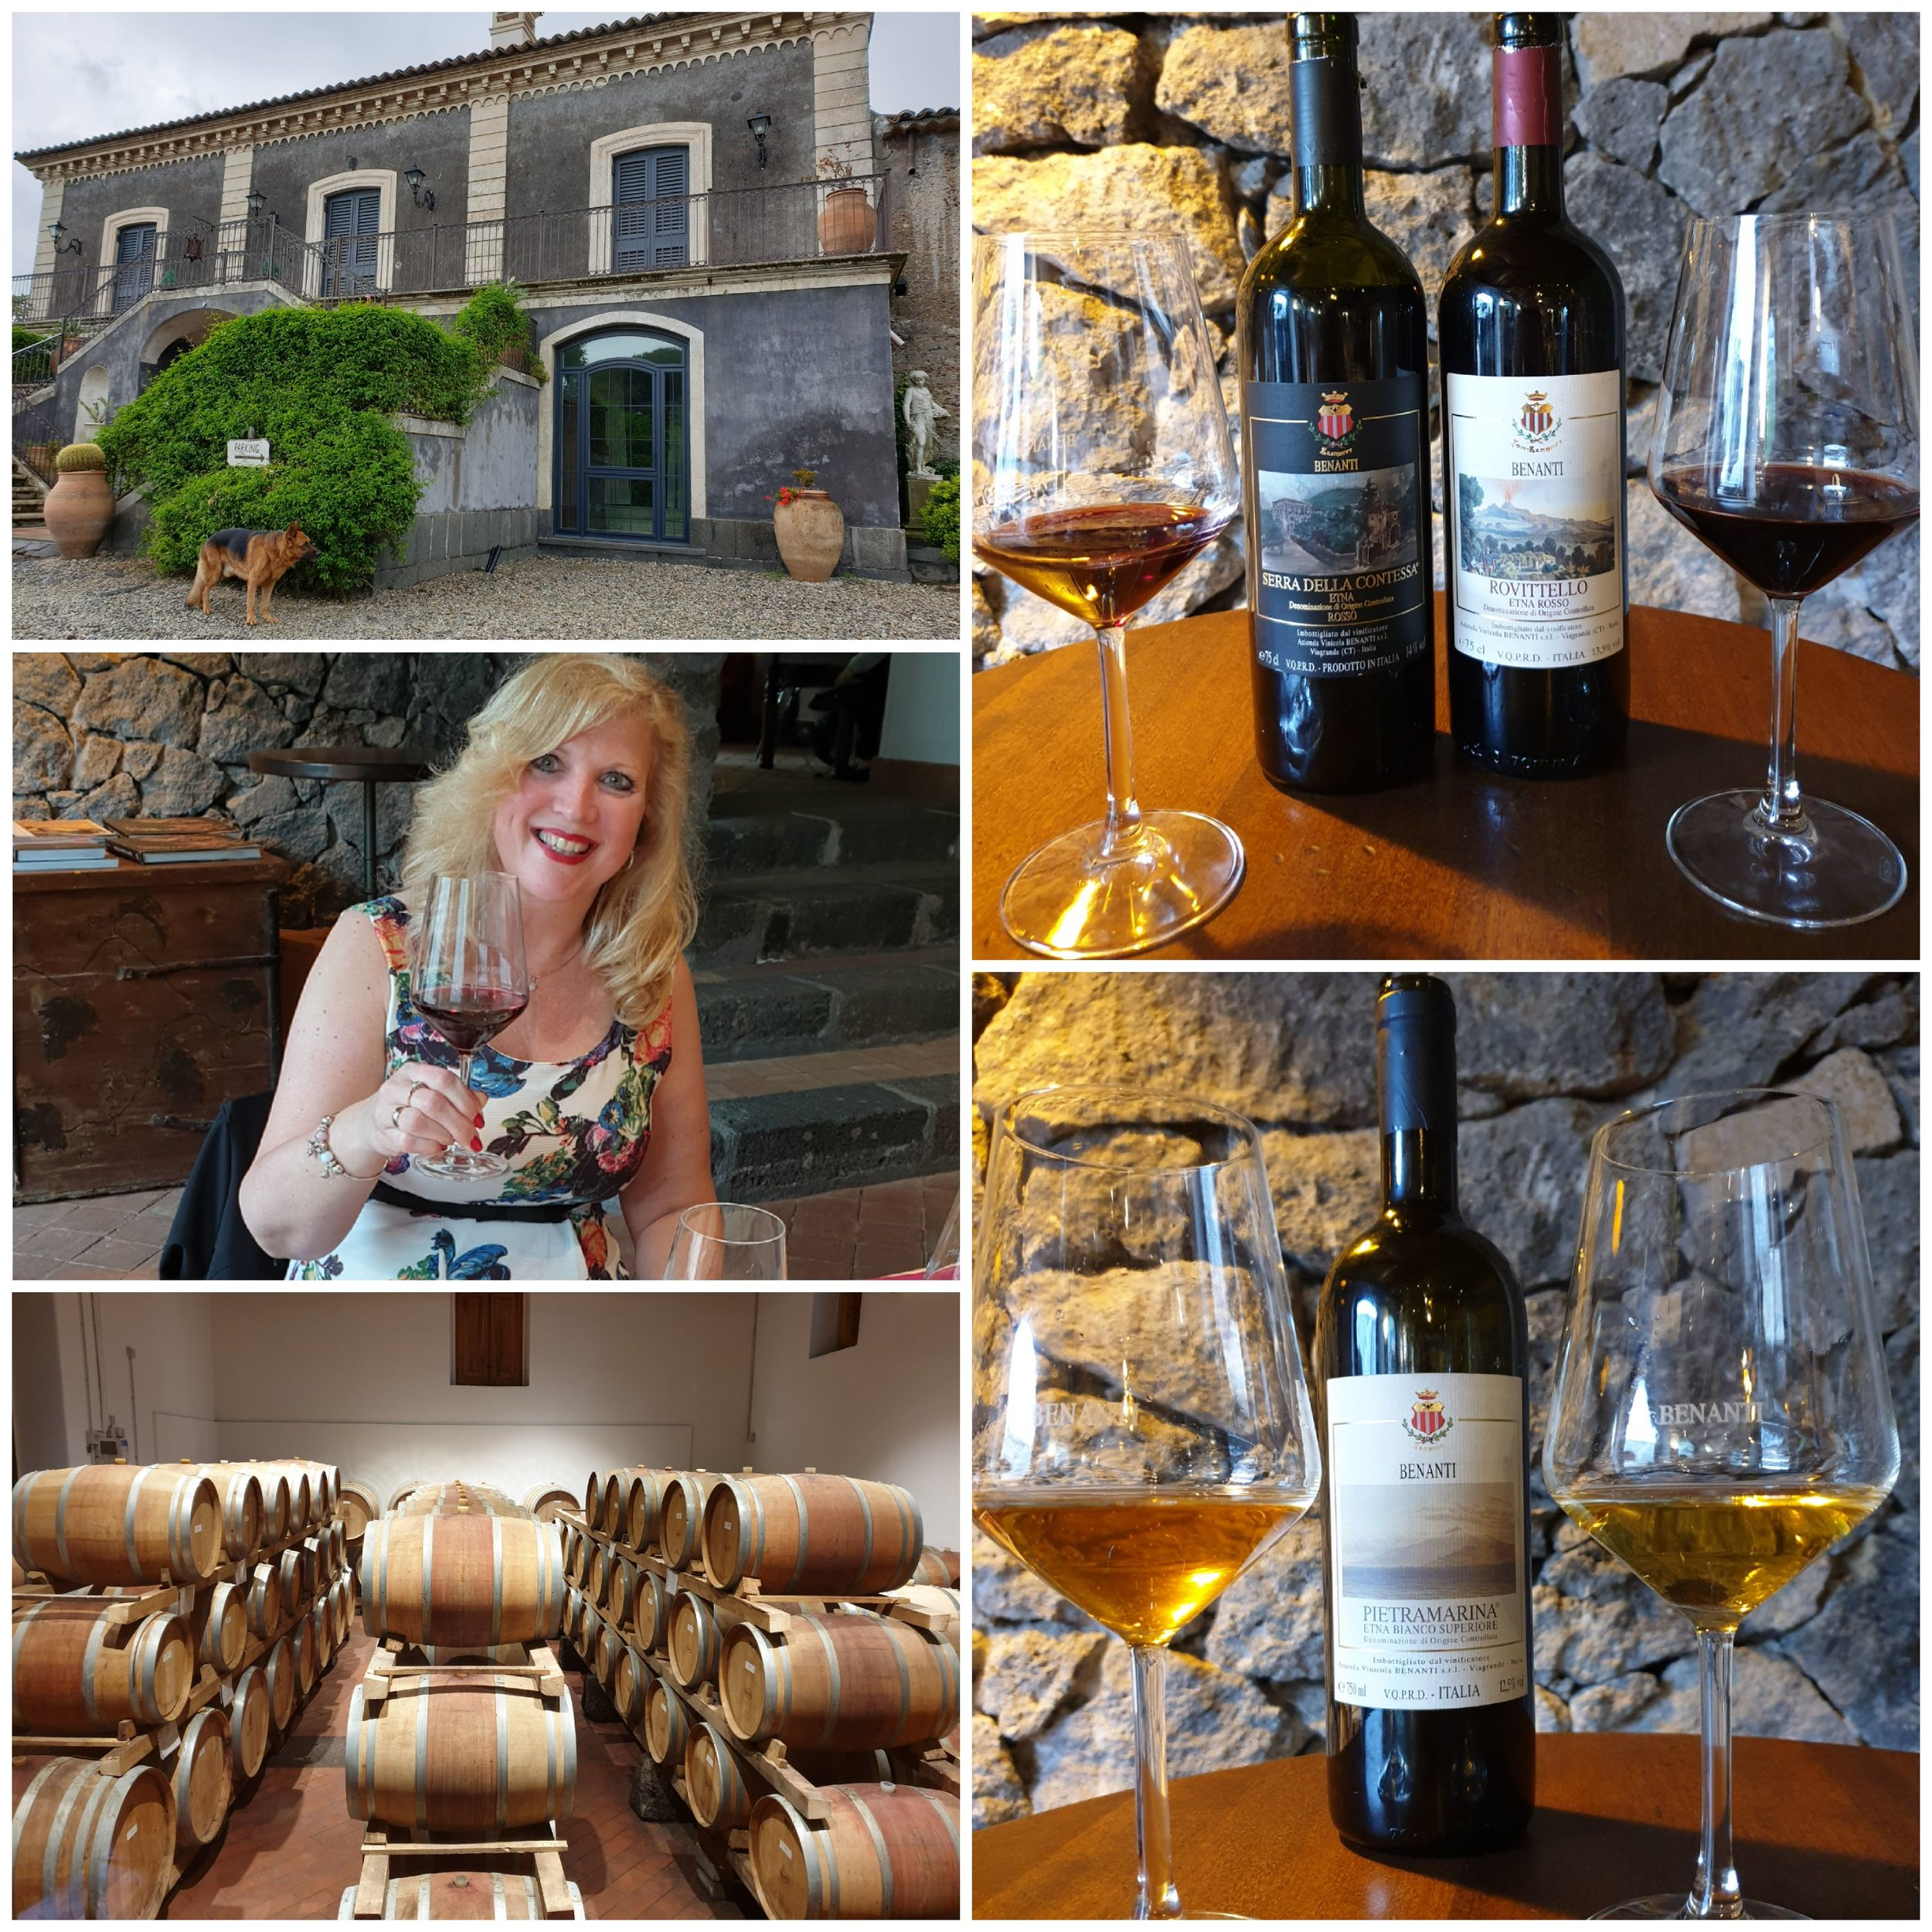 Etna, wijnhuis Benanti -